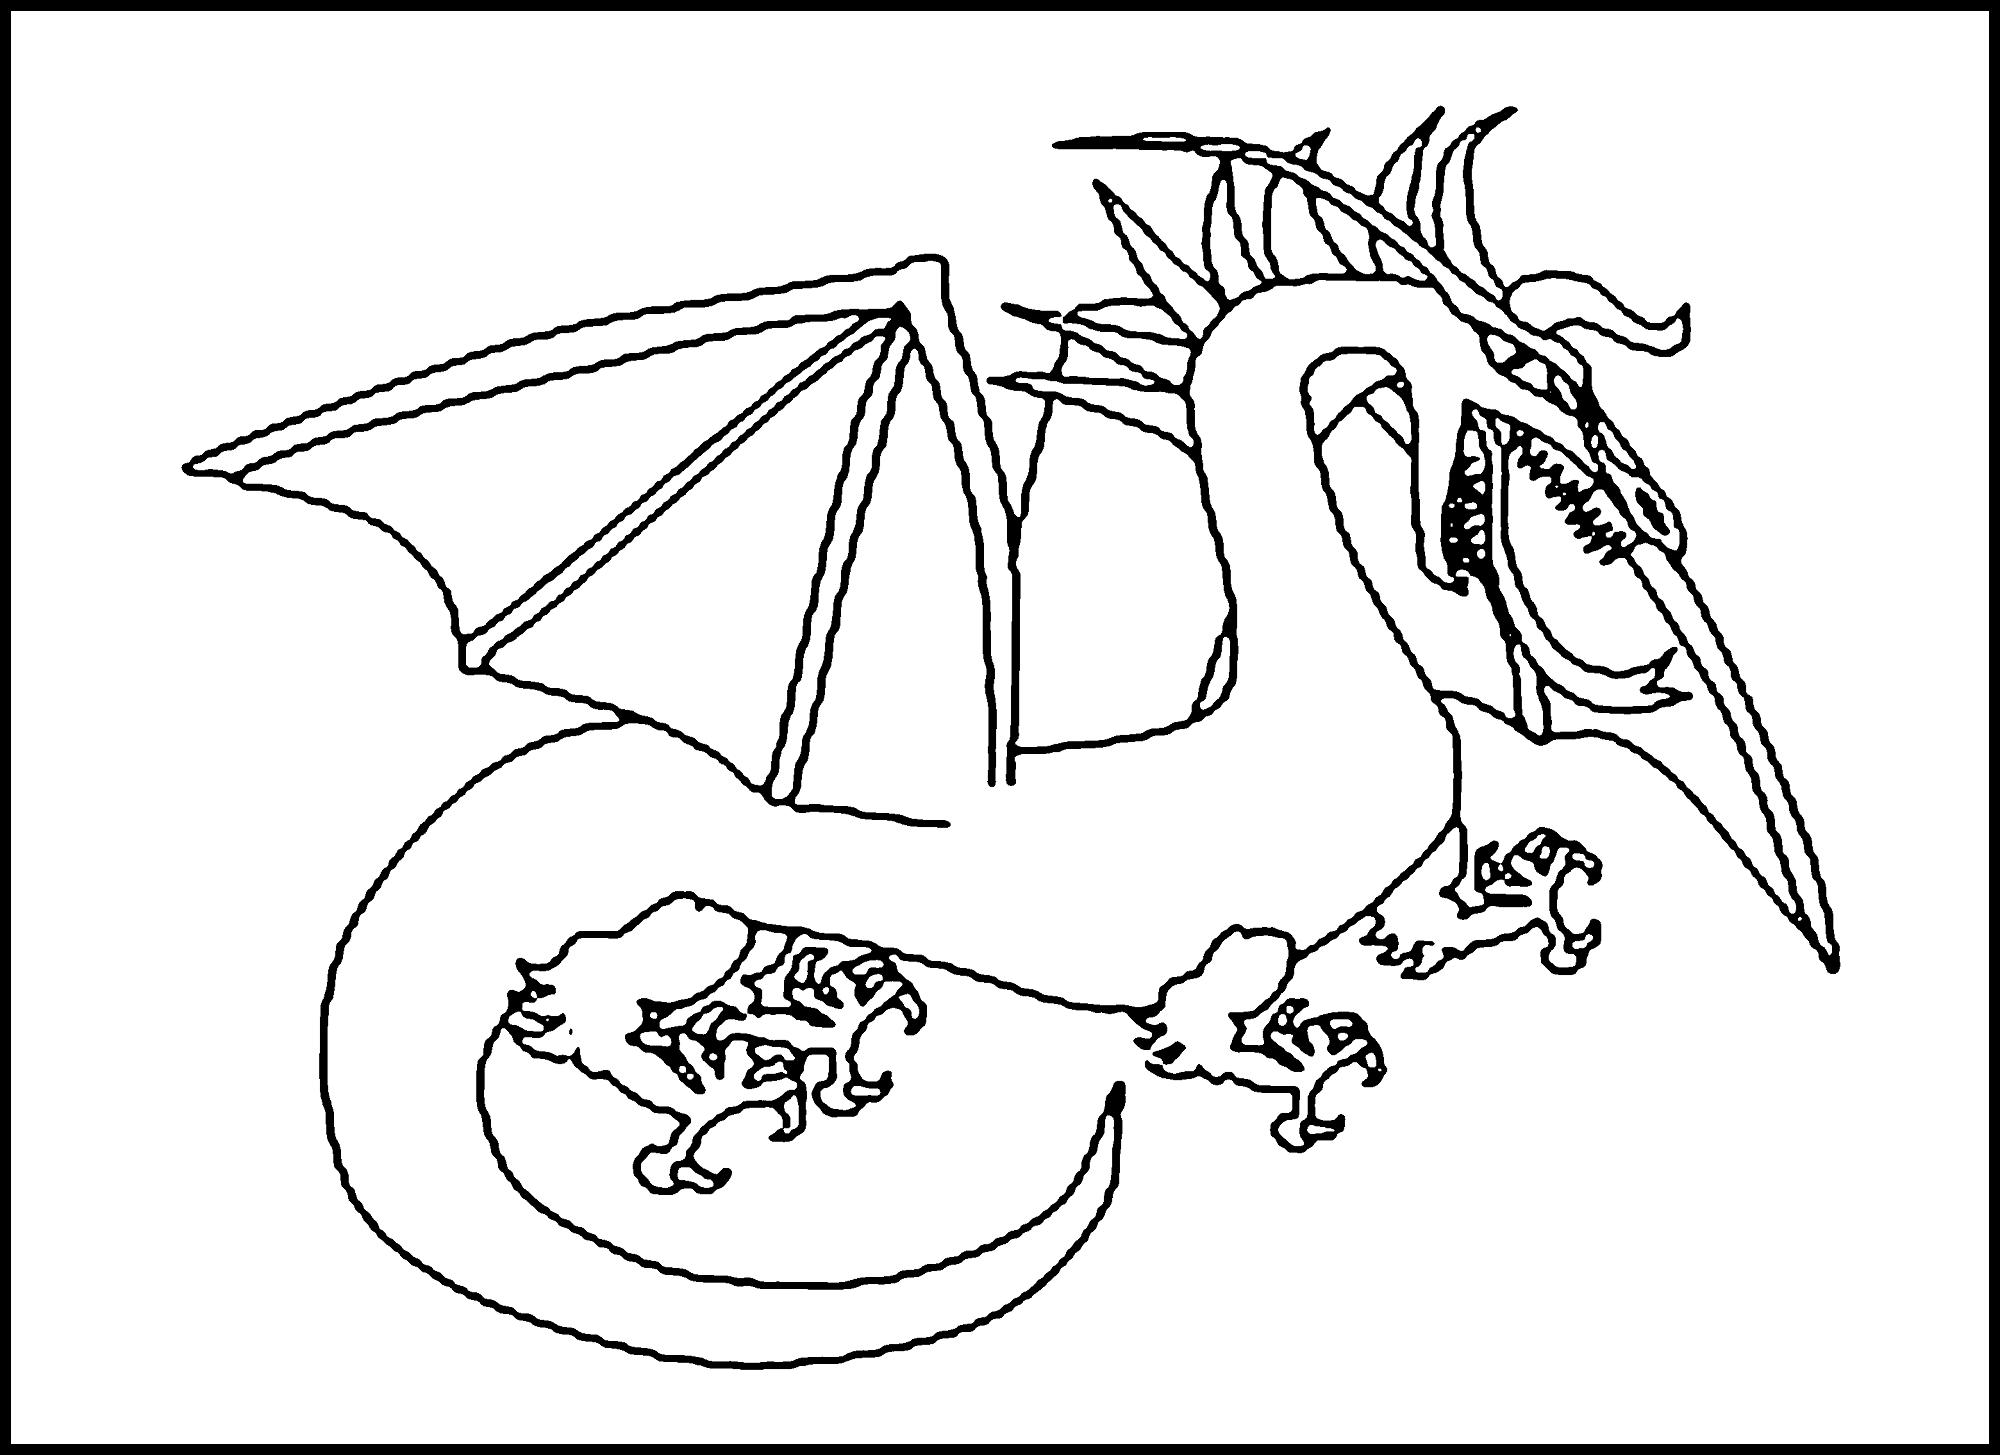 dragon pictures for kids printable dragon coloring pages for kids cool2bkids kids pictures for dragon